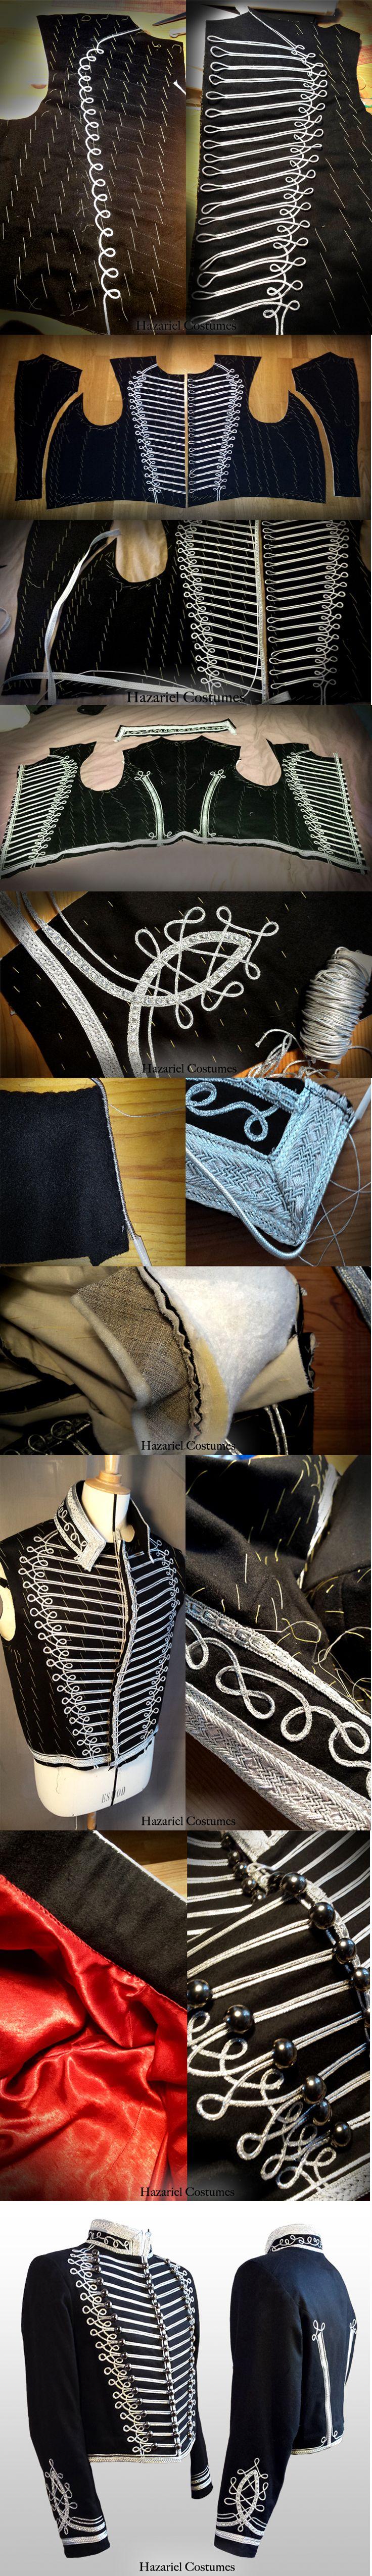 Hussar hussard jacket sewing steps